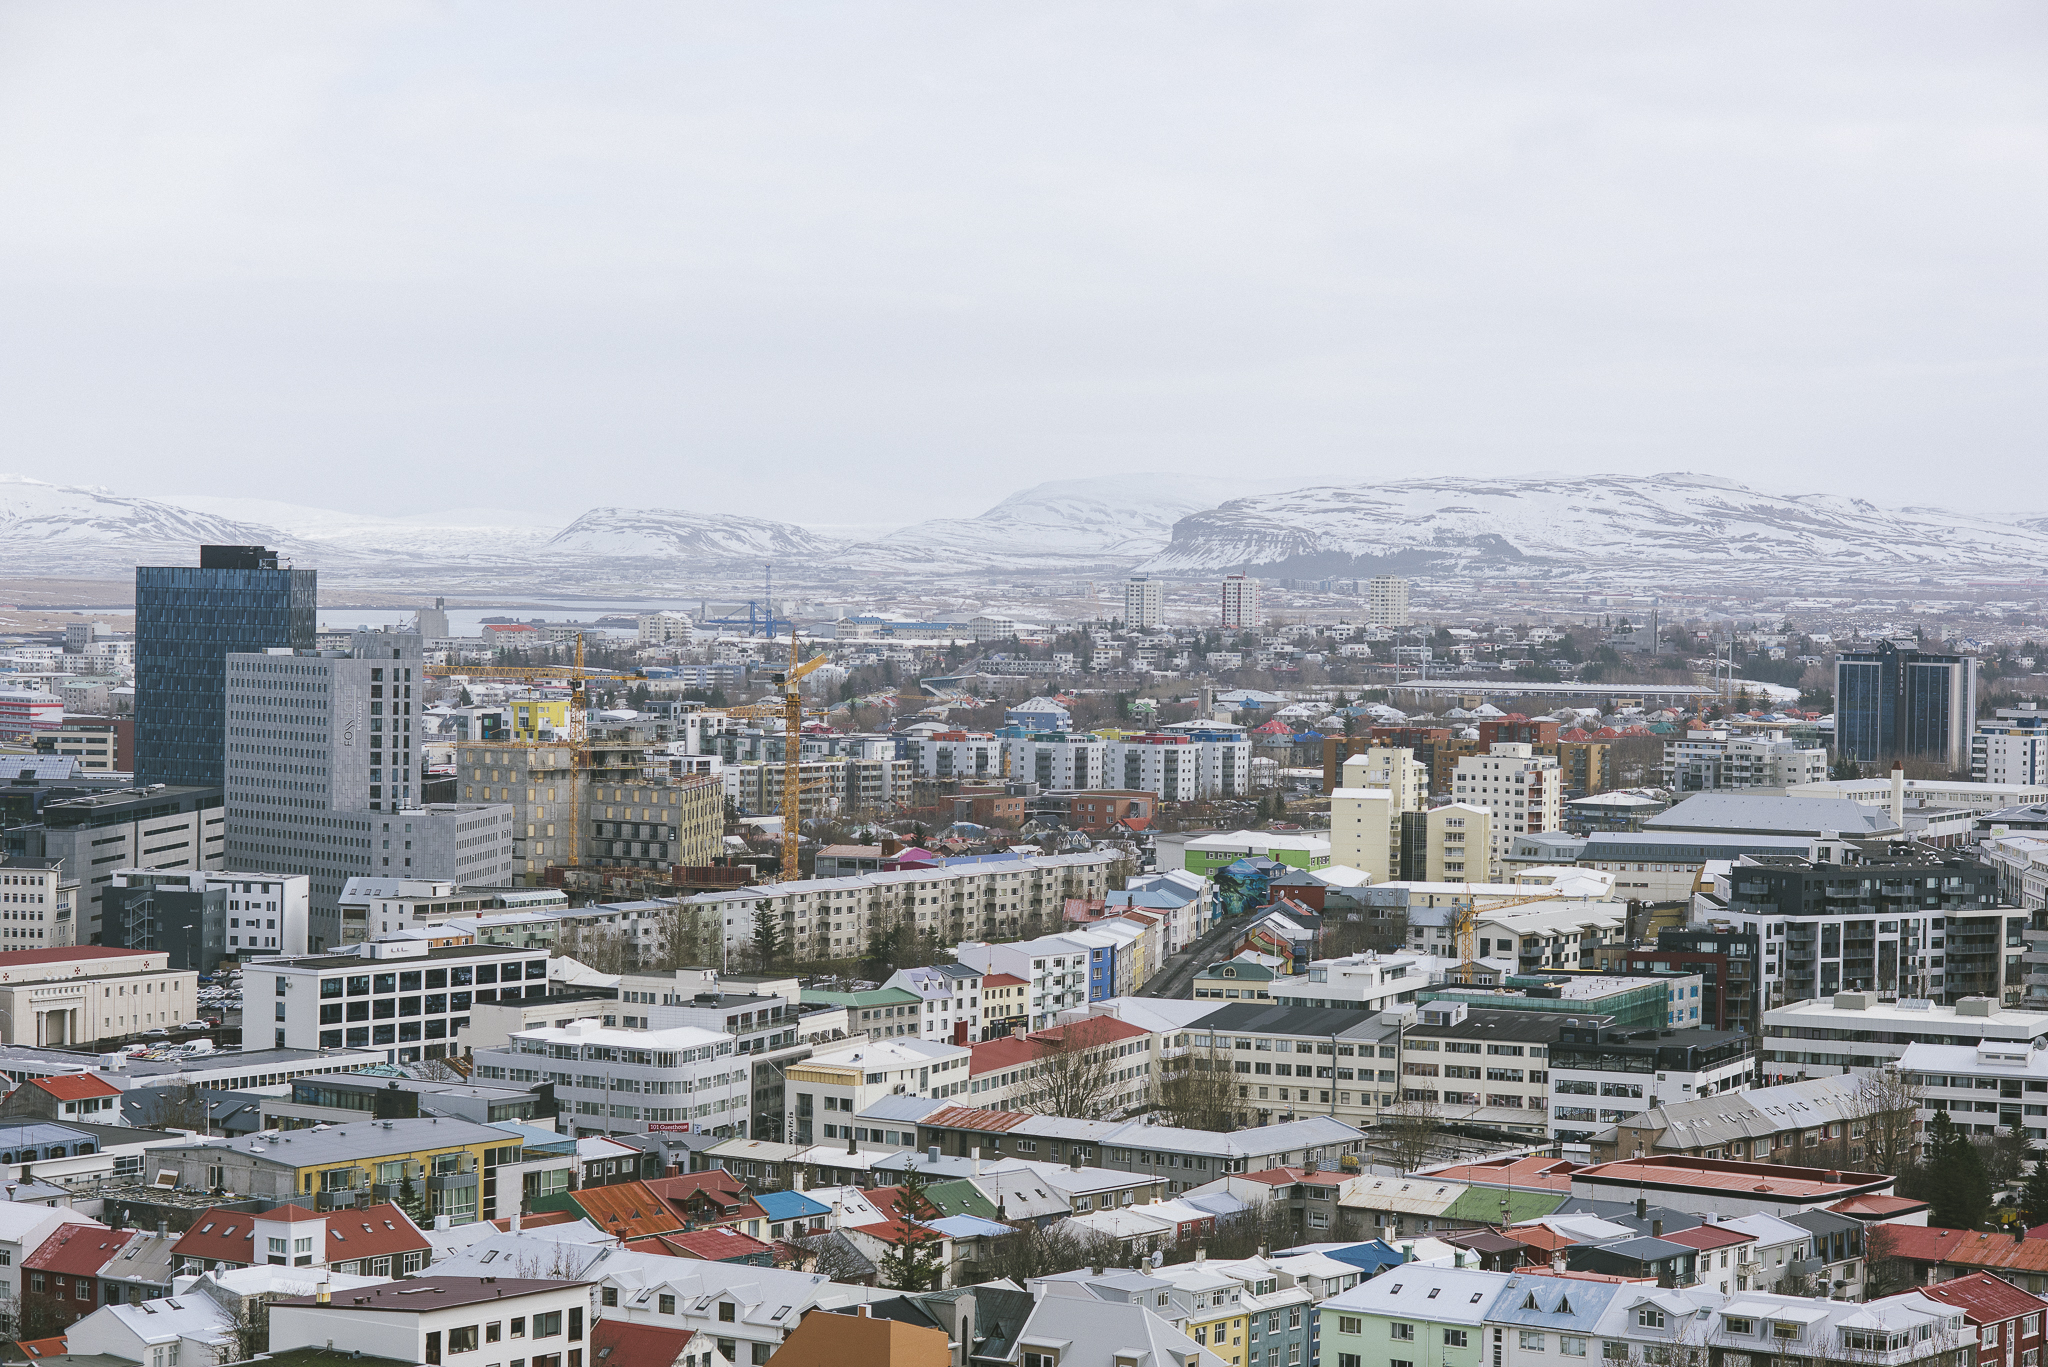 Reykjavik_13.03.17_0685.jpg